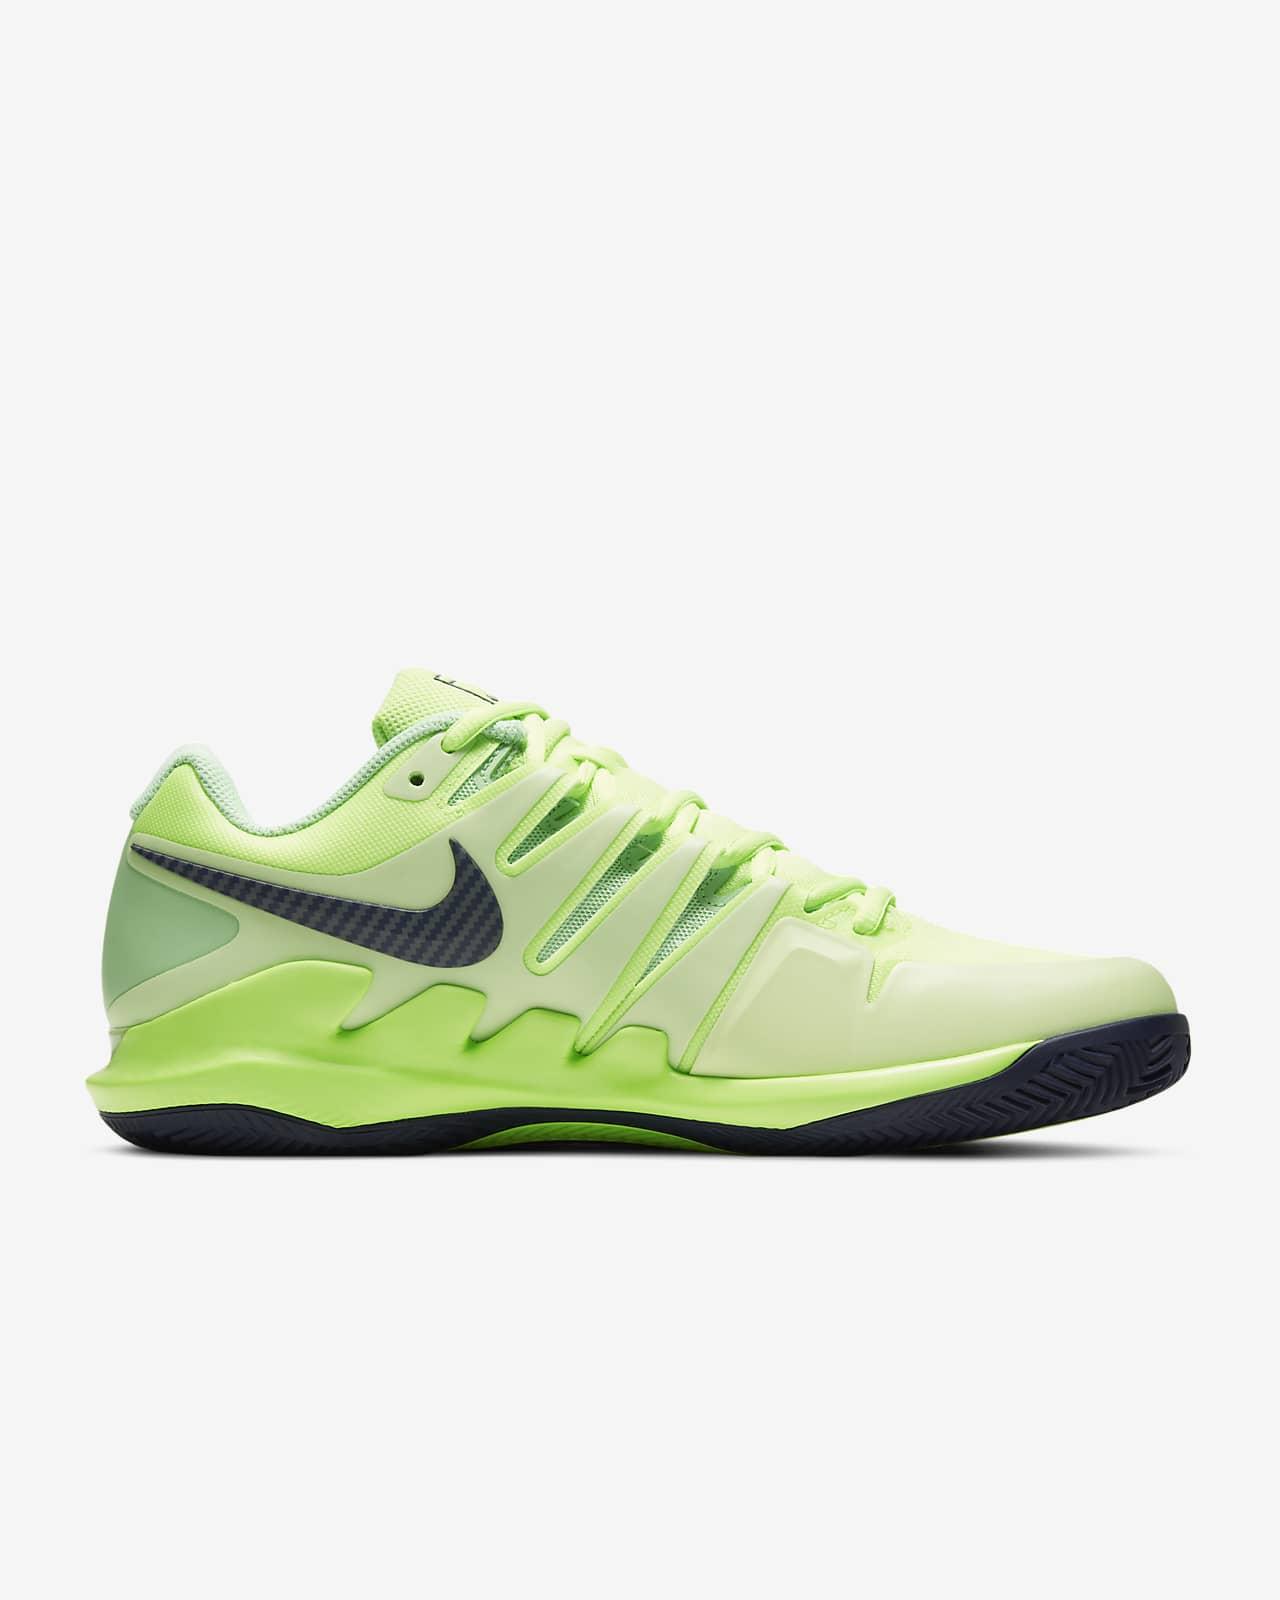 NikeCourt Air Zoom Vapor X Men's Clay Tennis Shoes